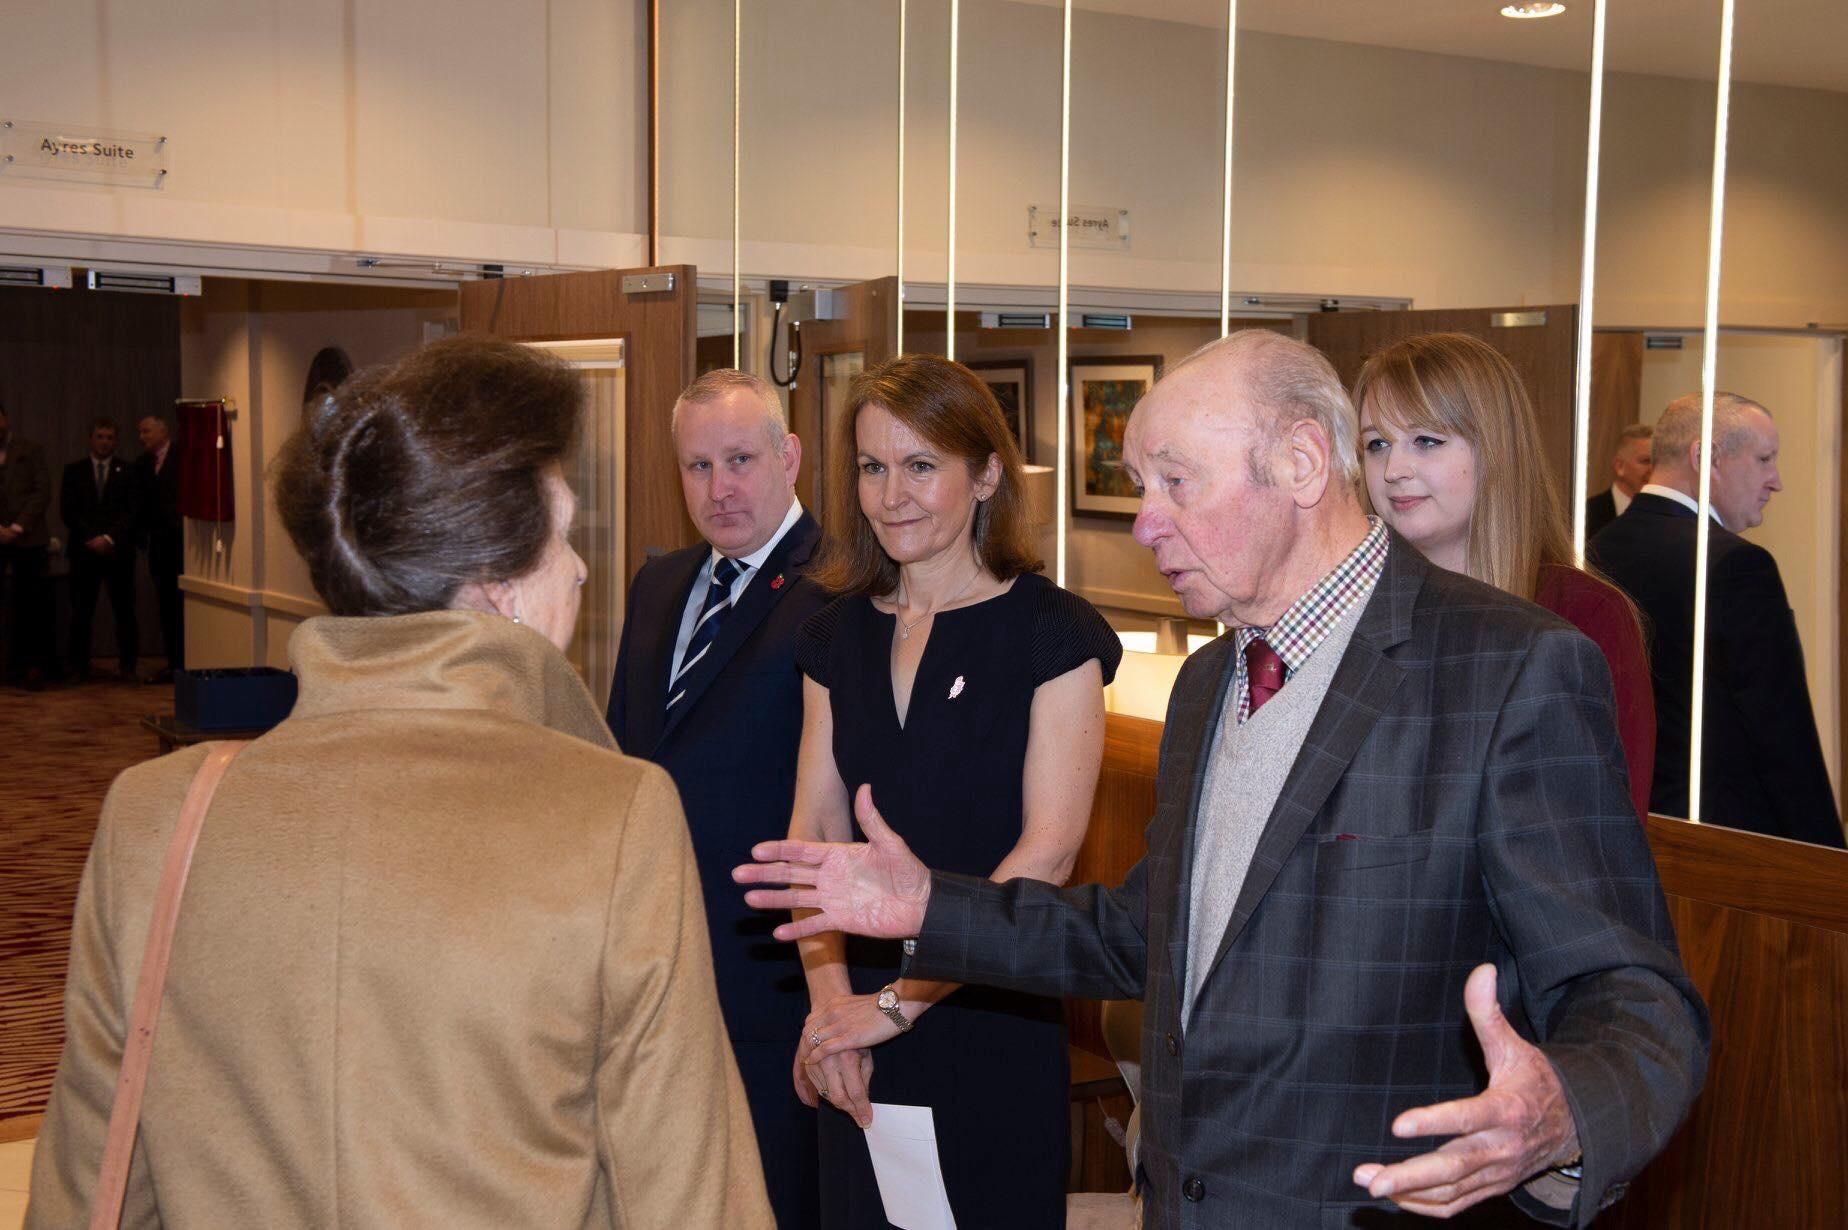 Princess Anne October 2019